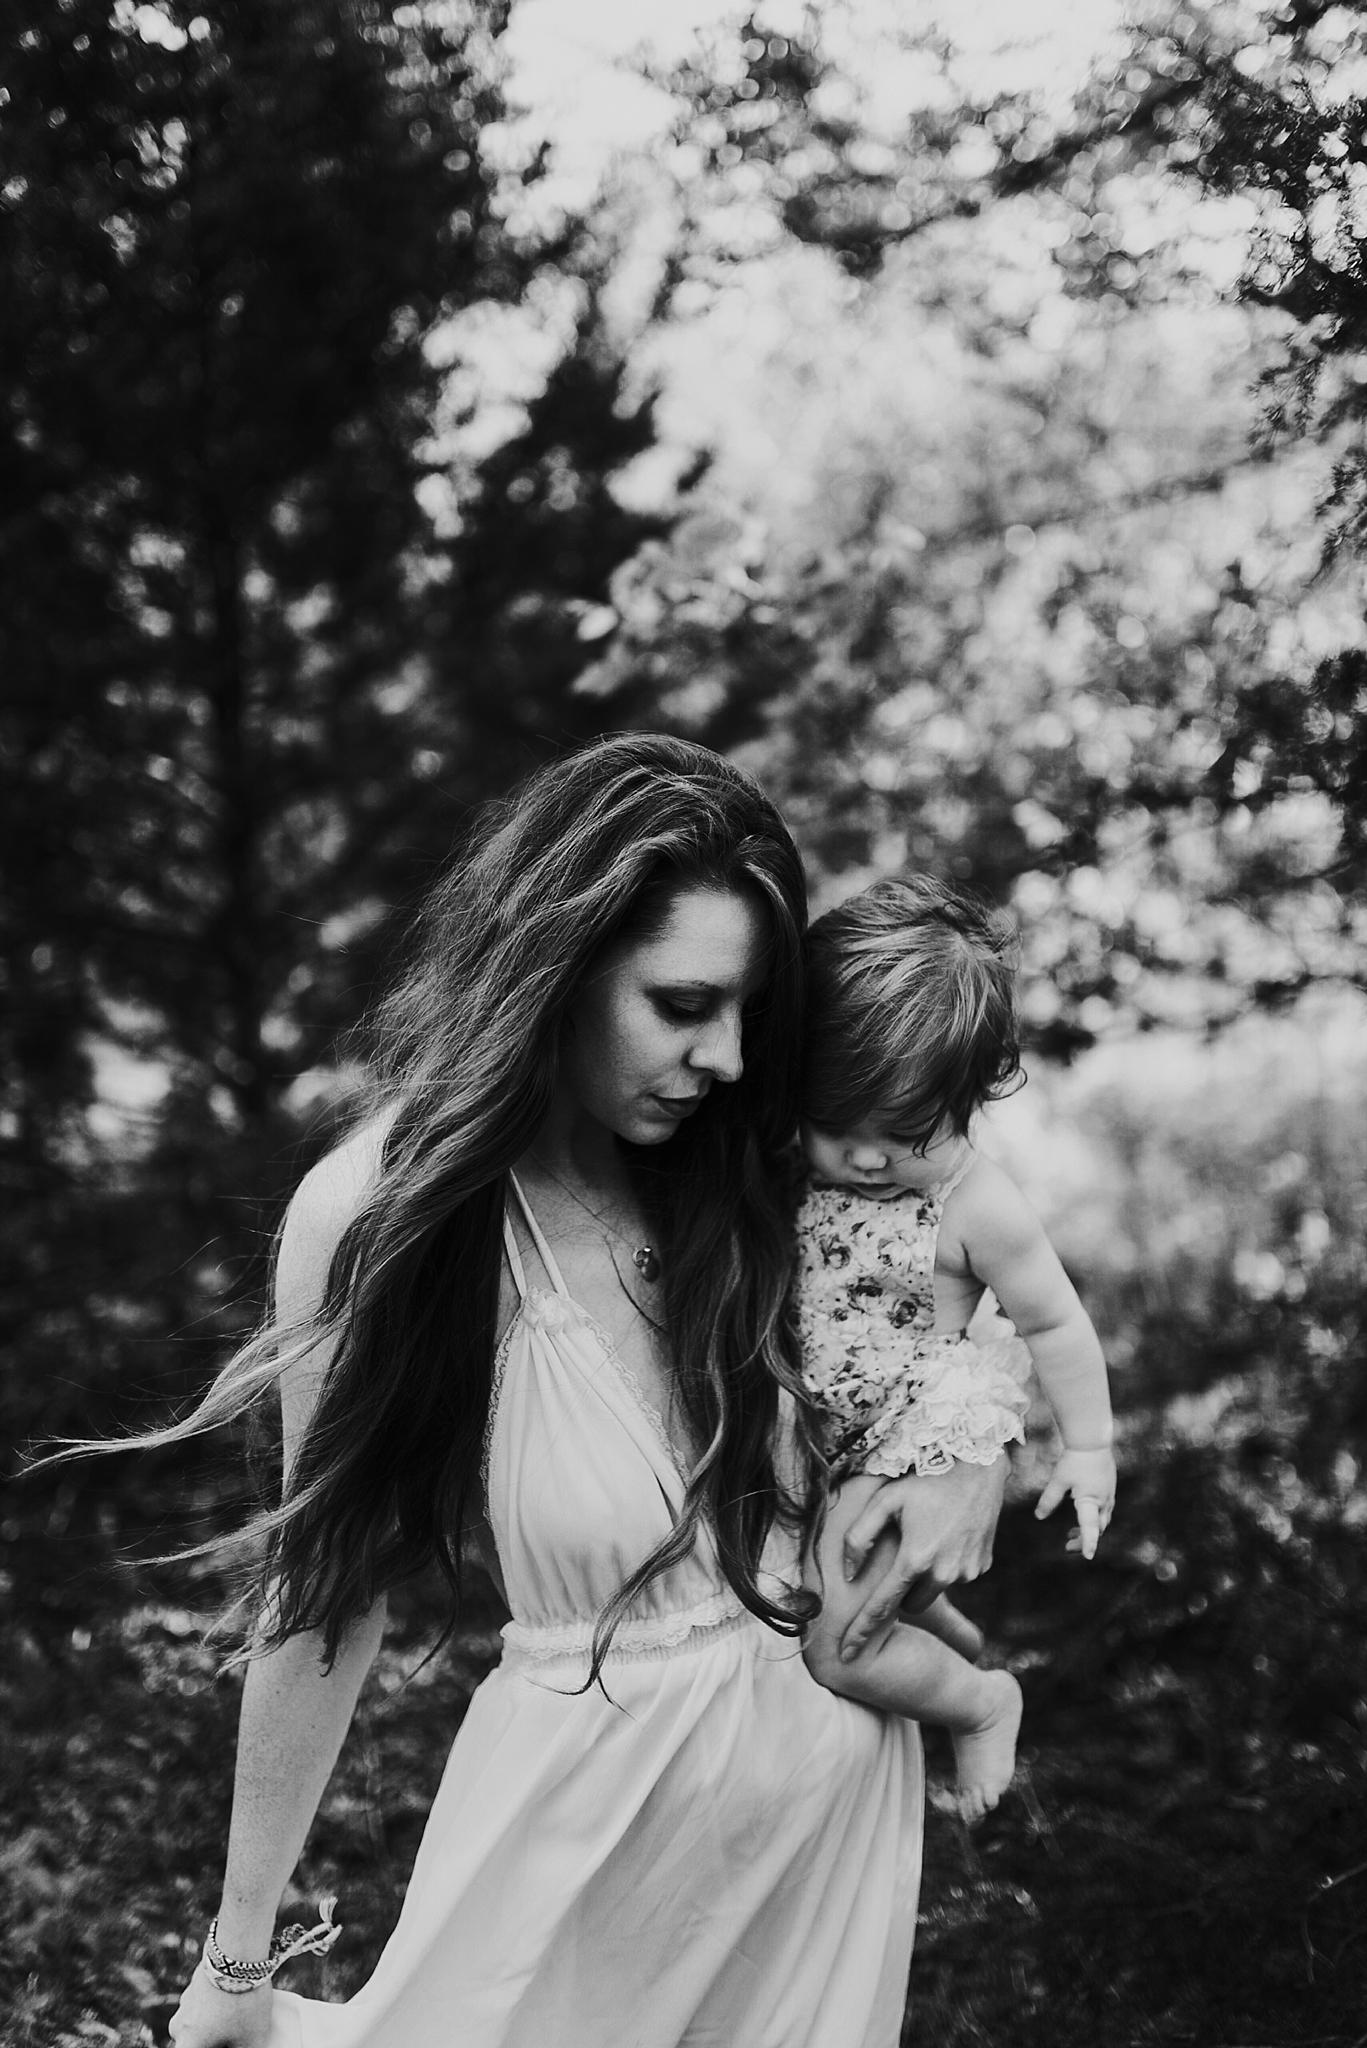 twyla jones photography - mother daughter - field and forest-4210_treasure coast florida.jpg